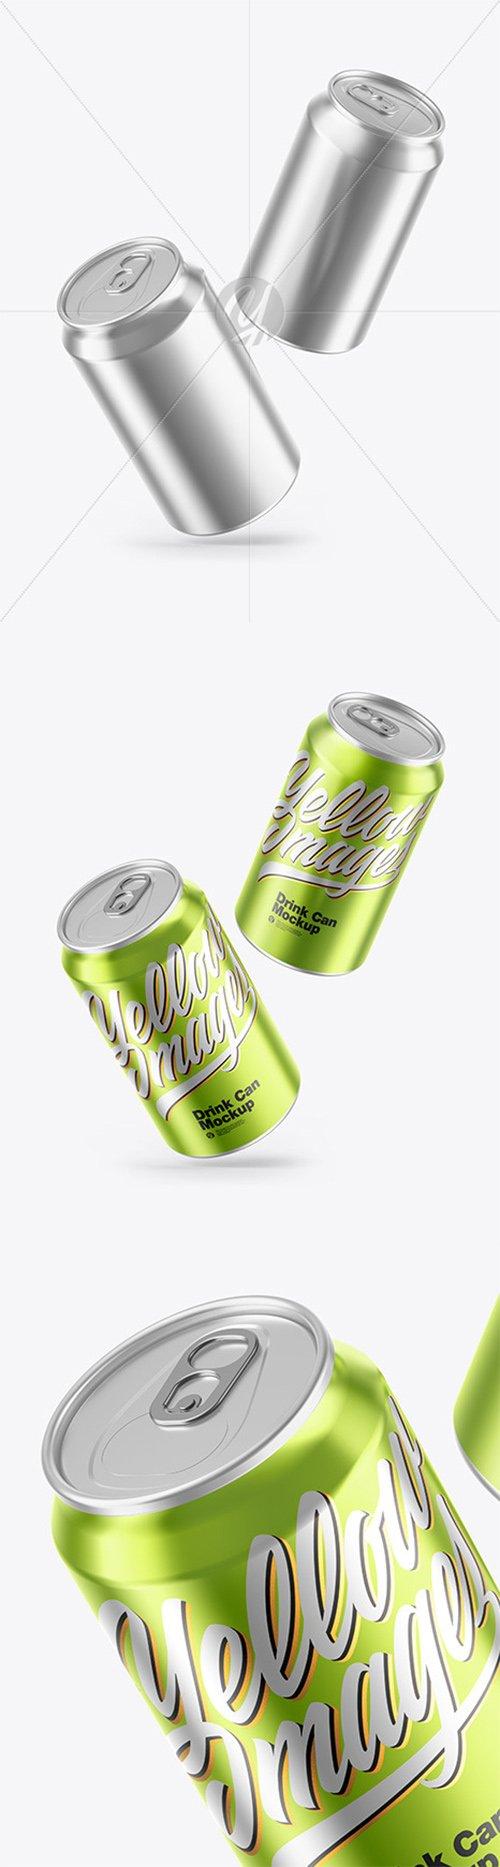 Glossy Metallic Drink Cans Mockup 66564 TIF